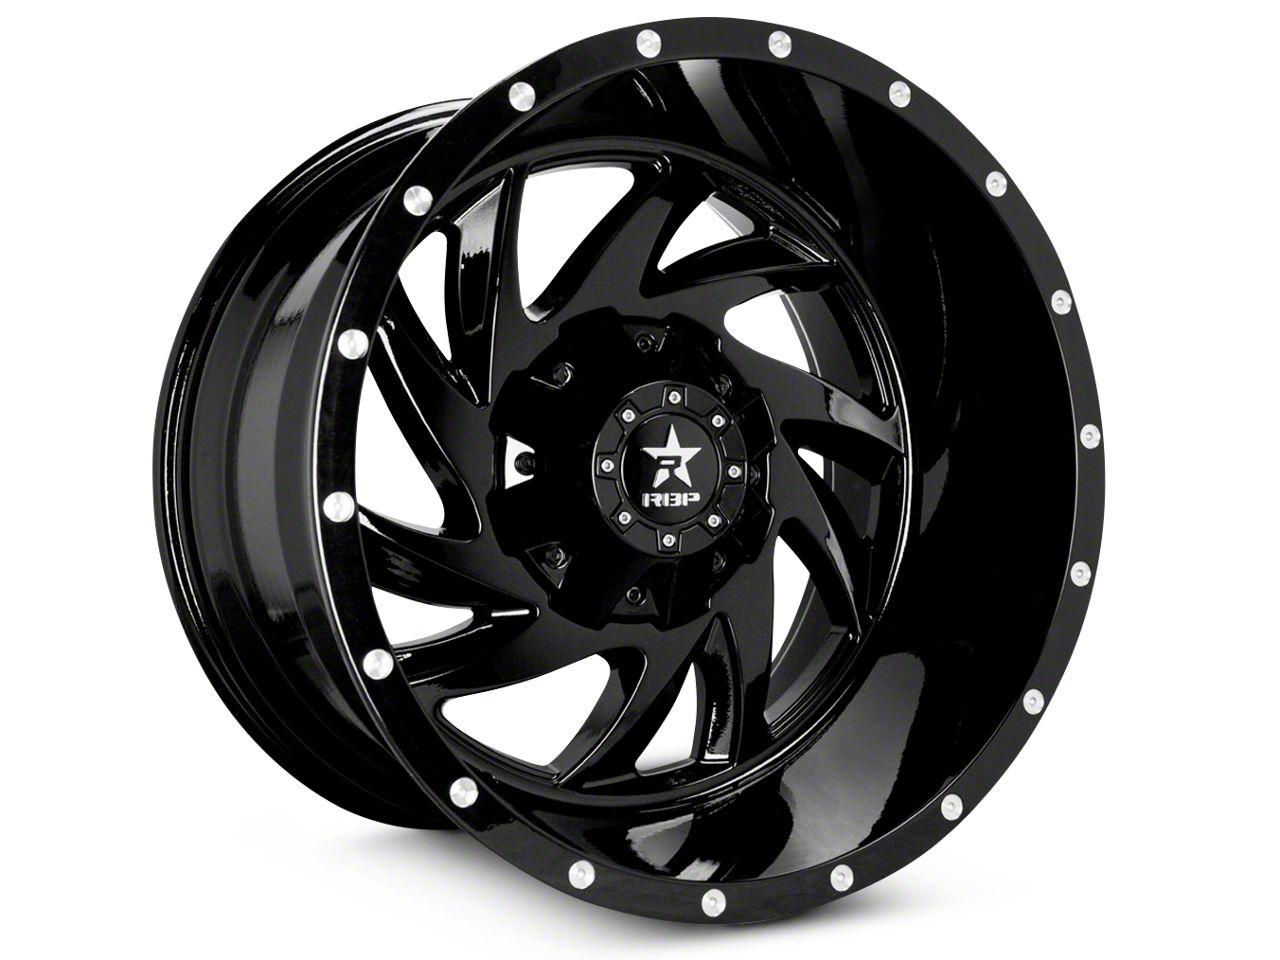 RBP 66R HK-5 Gloss Black 5-Lug Wheel - 20x9 (02-18 RAM 1500, Excluding Mega Cab)